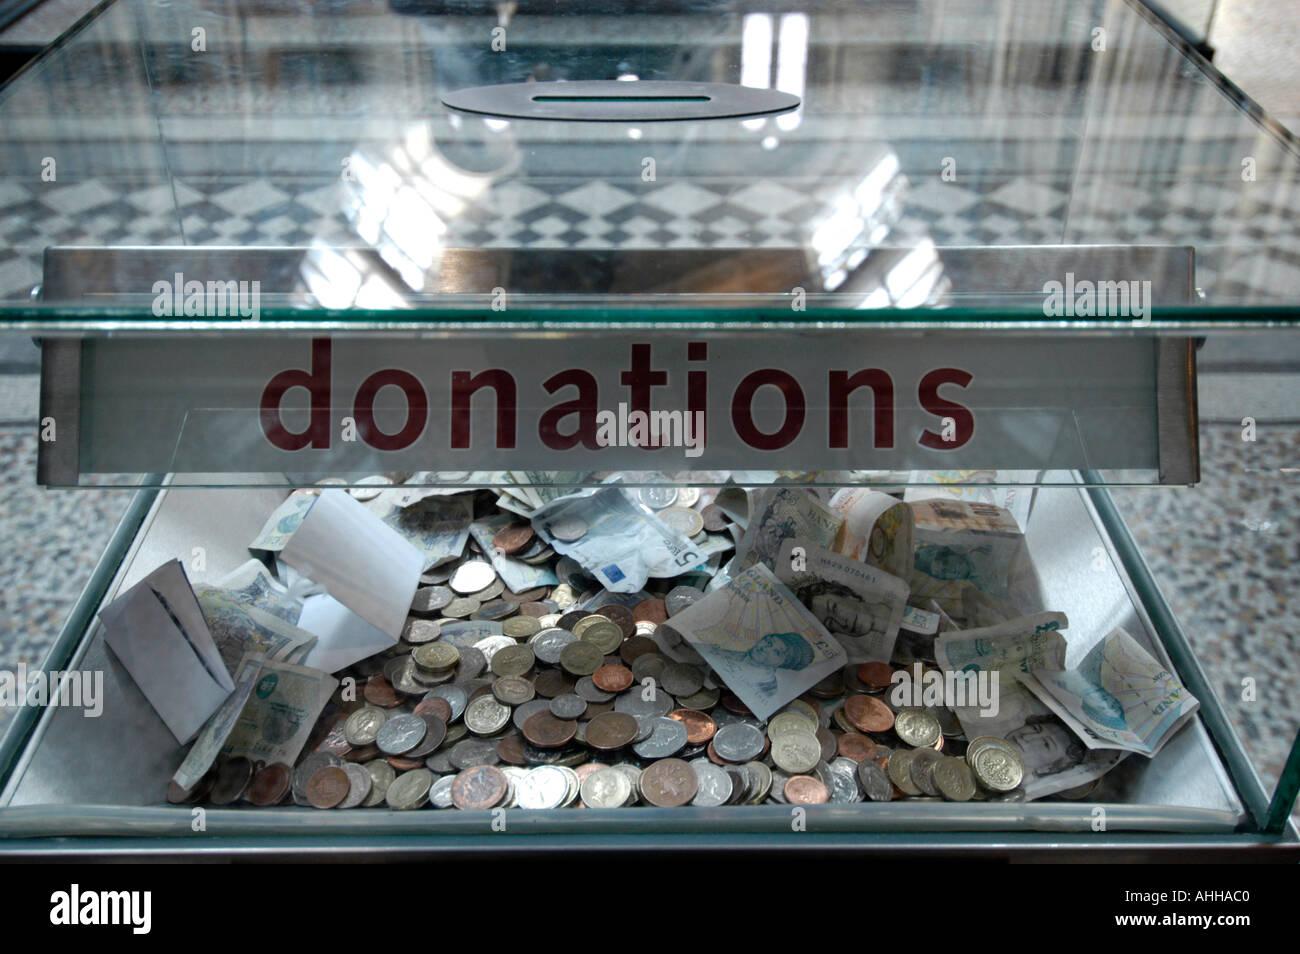 Museum donations box, London, England UK - Stock Image